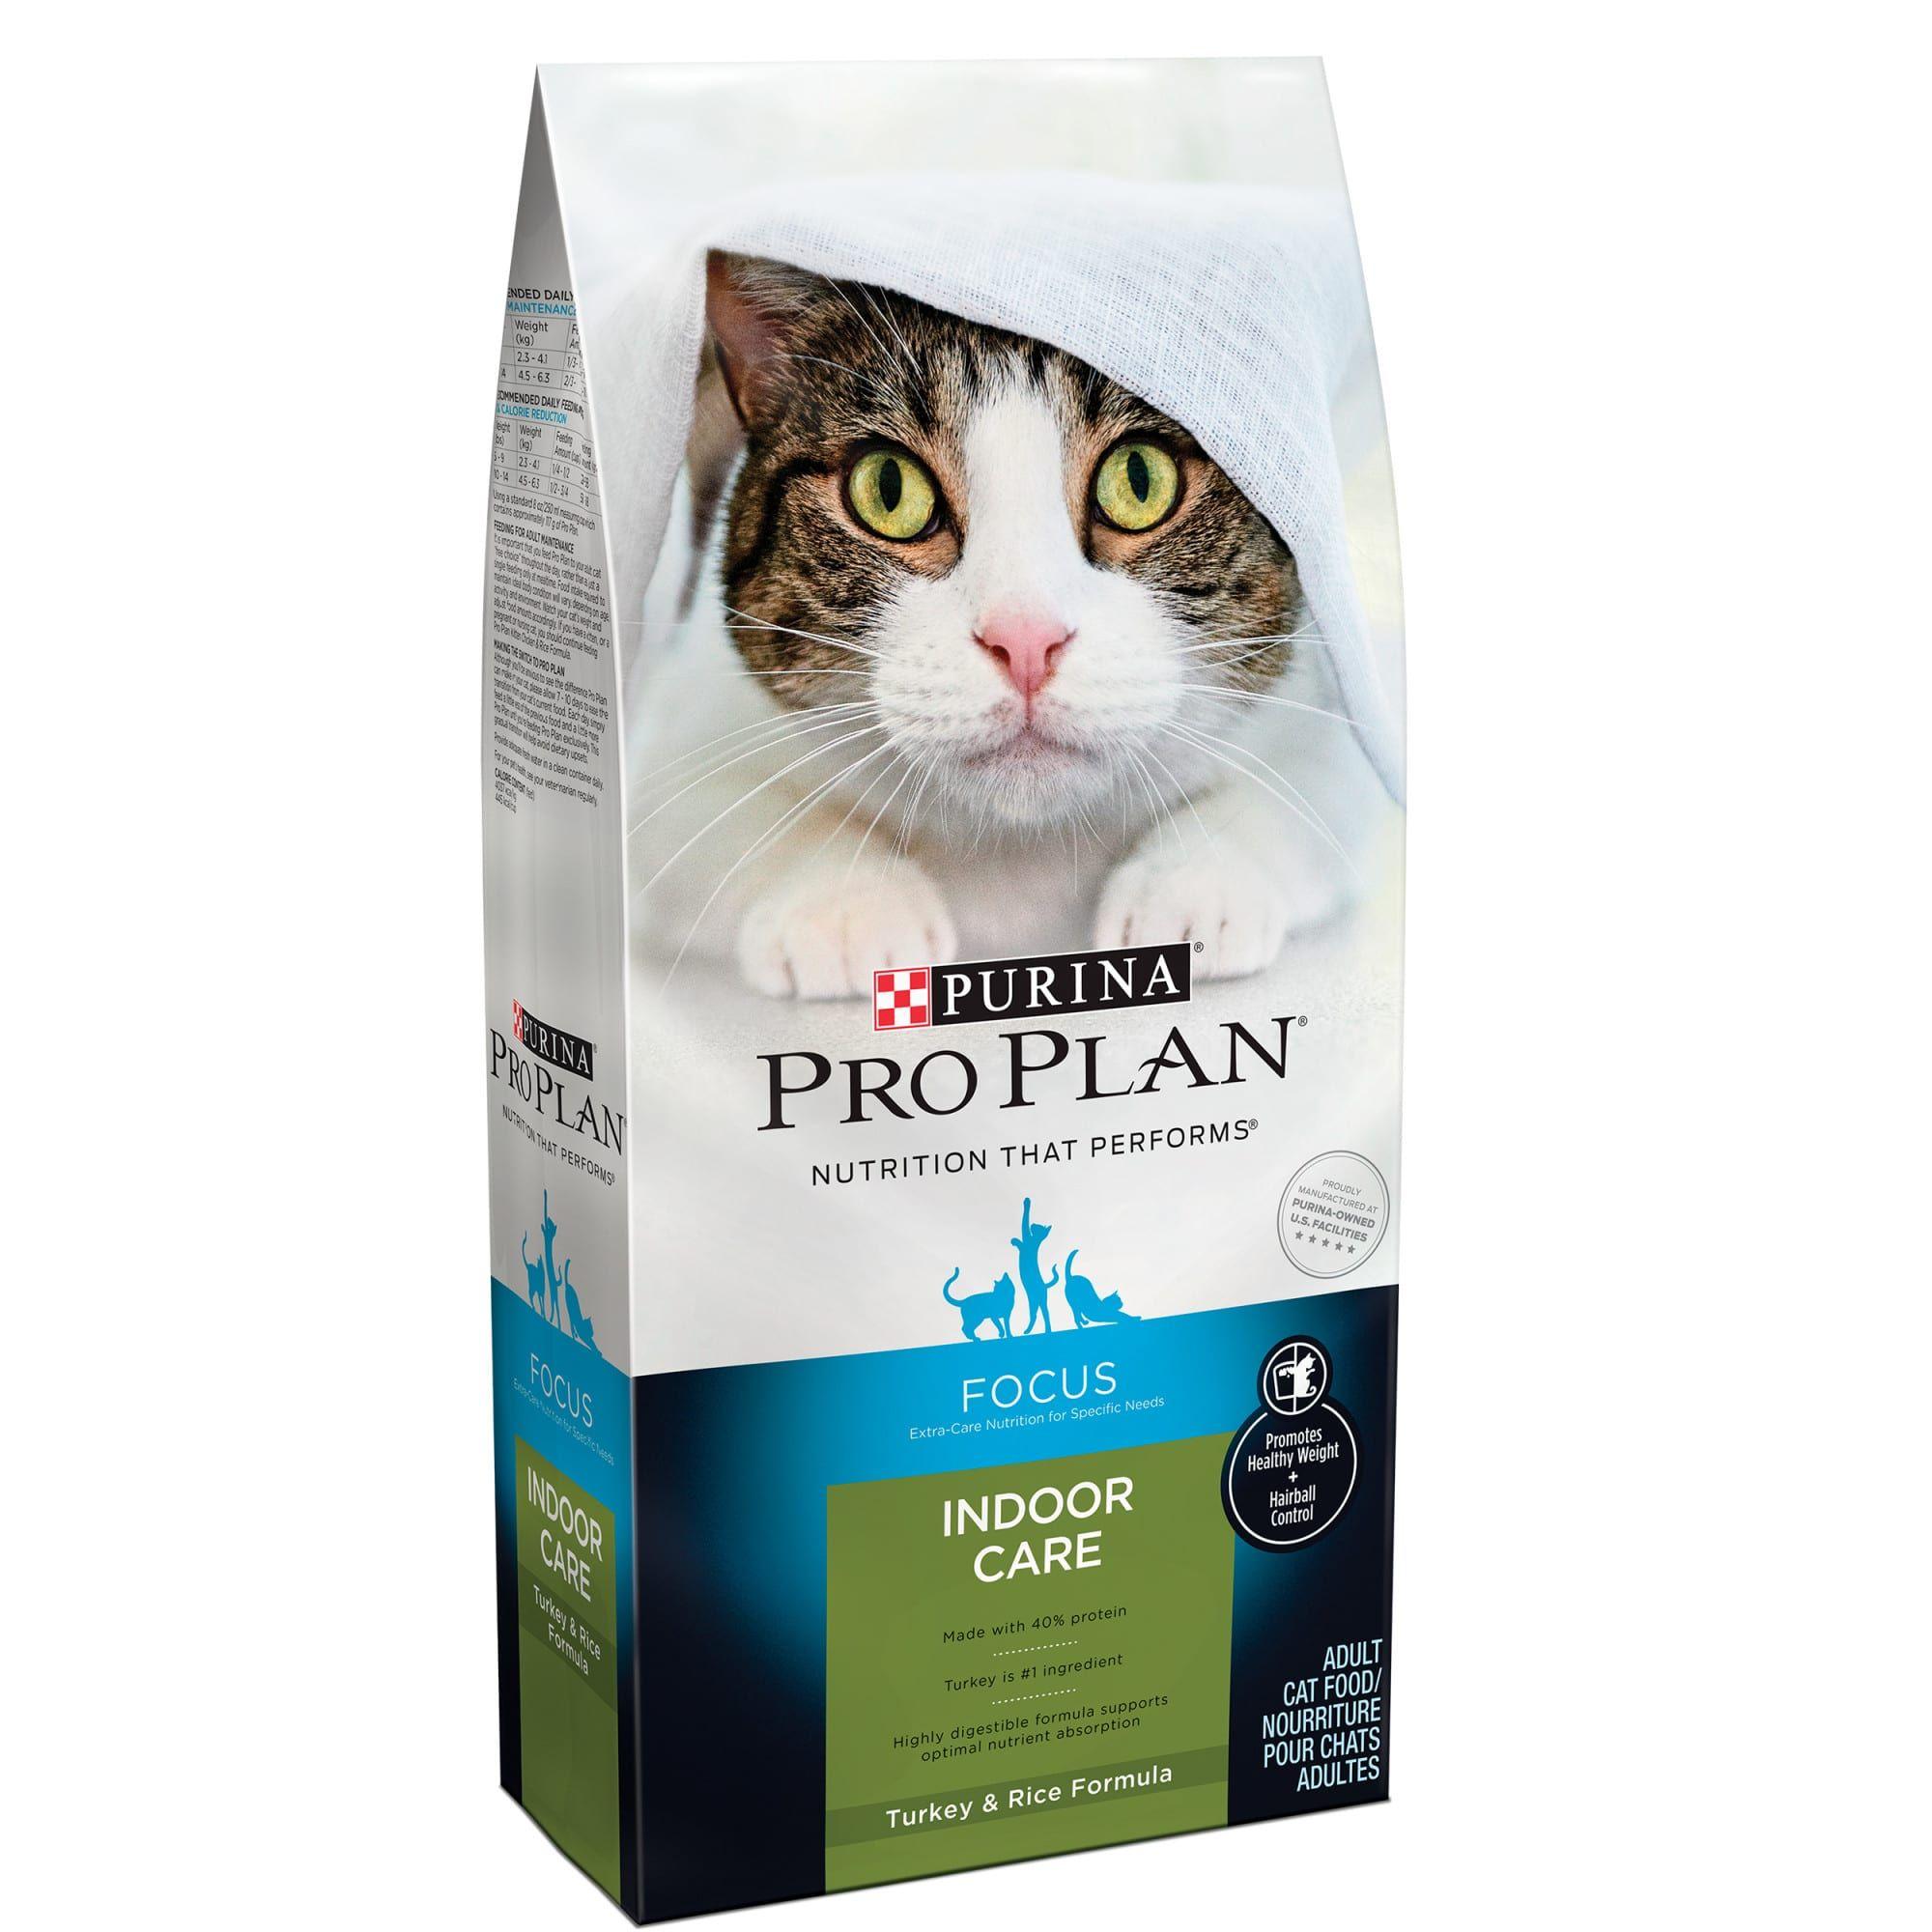 Purina Pro Plan Focus Indoor Care Turkey Rice Formula Adult Dry